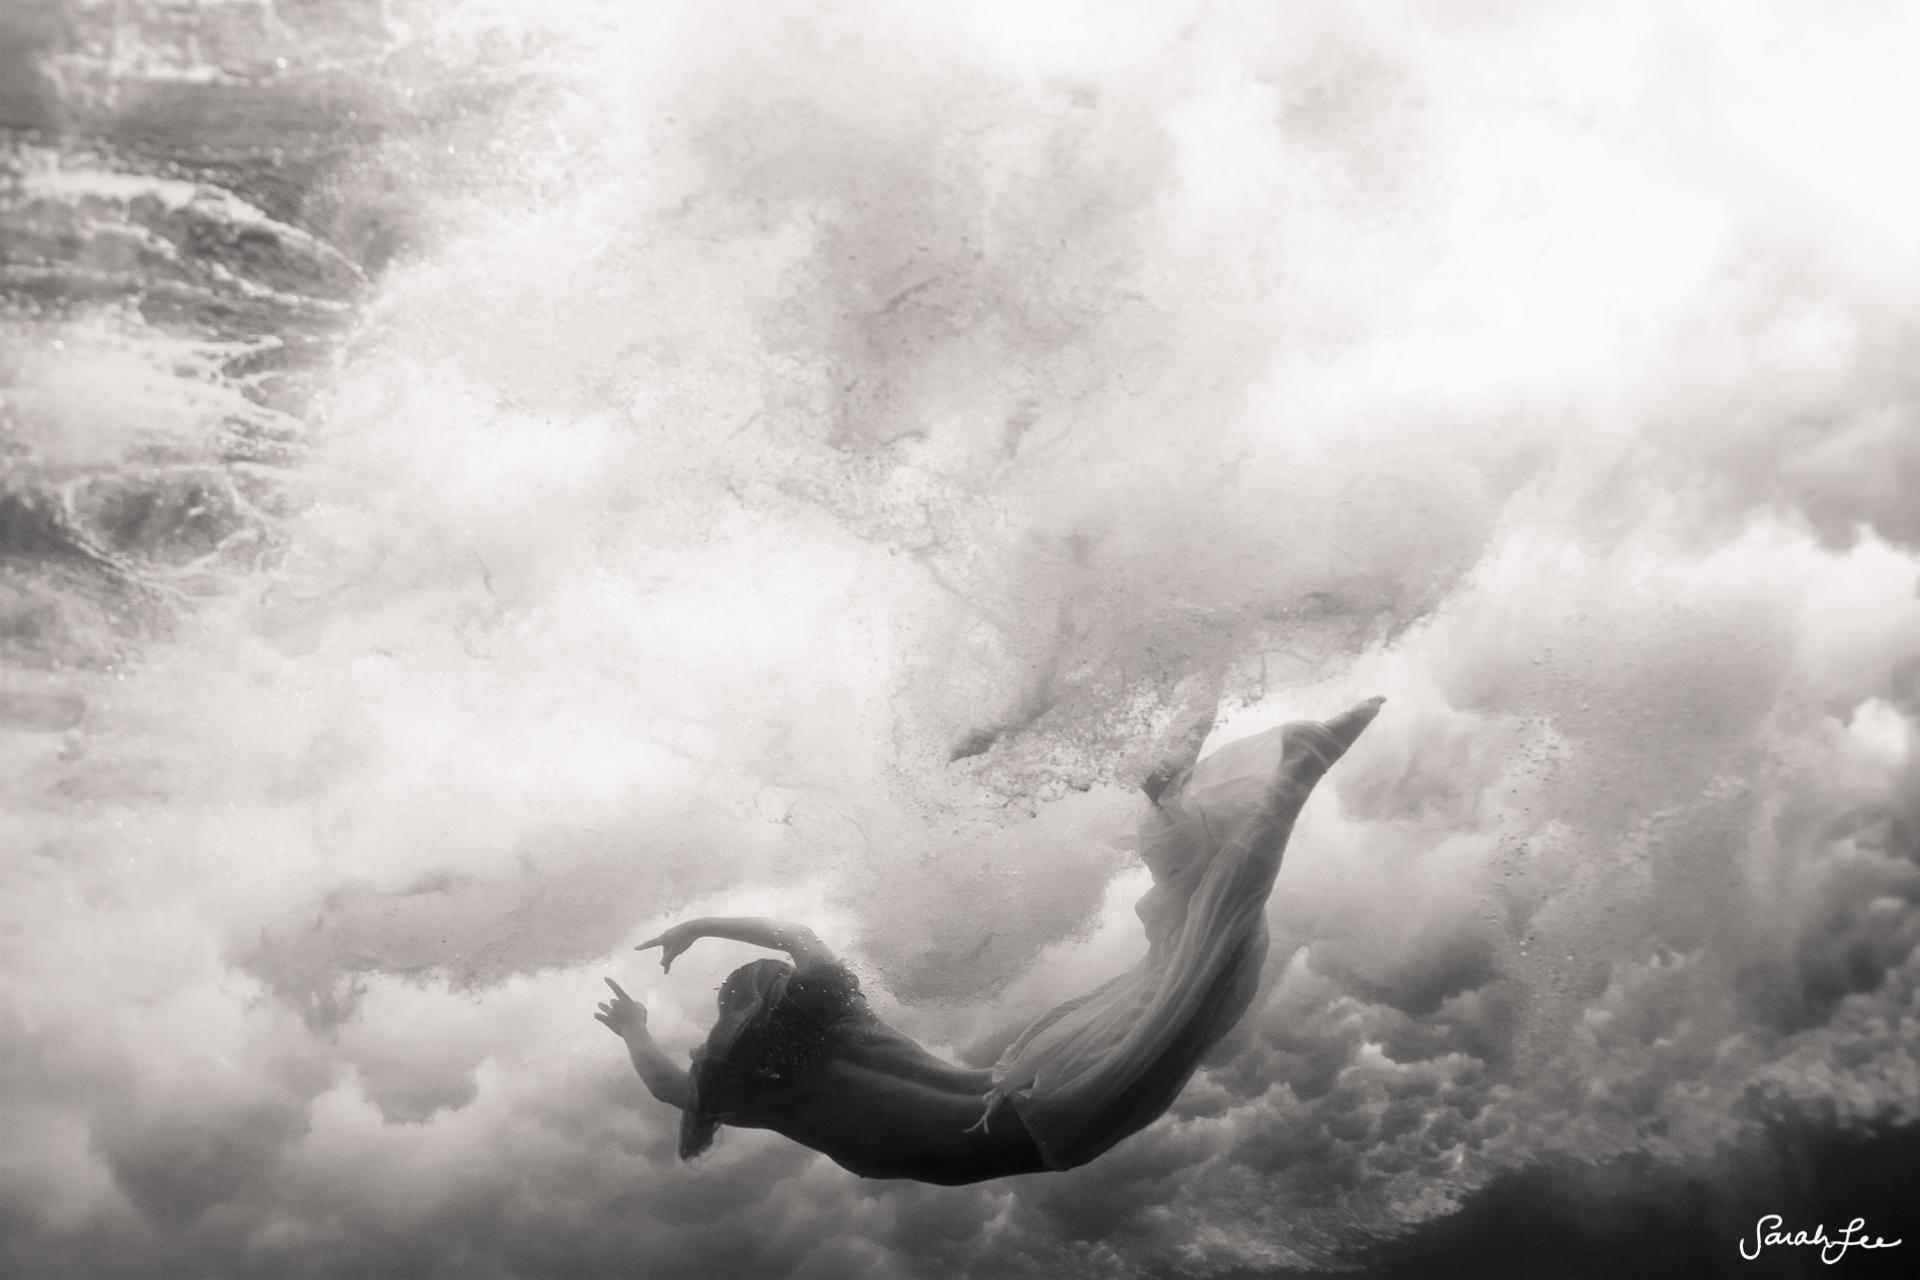 020_Sarah_Lee_Photography_Underwater_2122.jpg